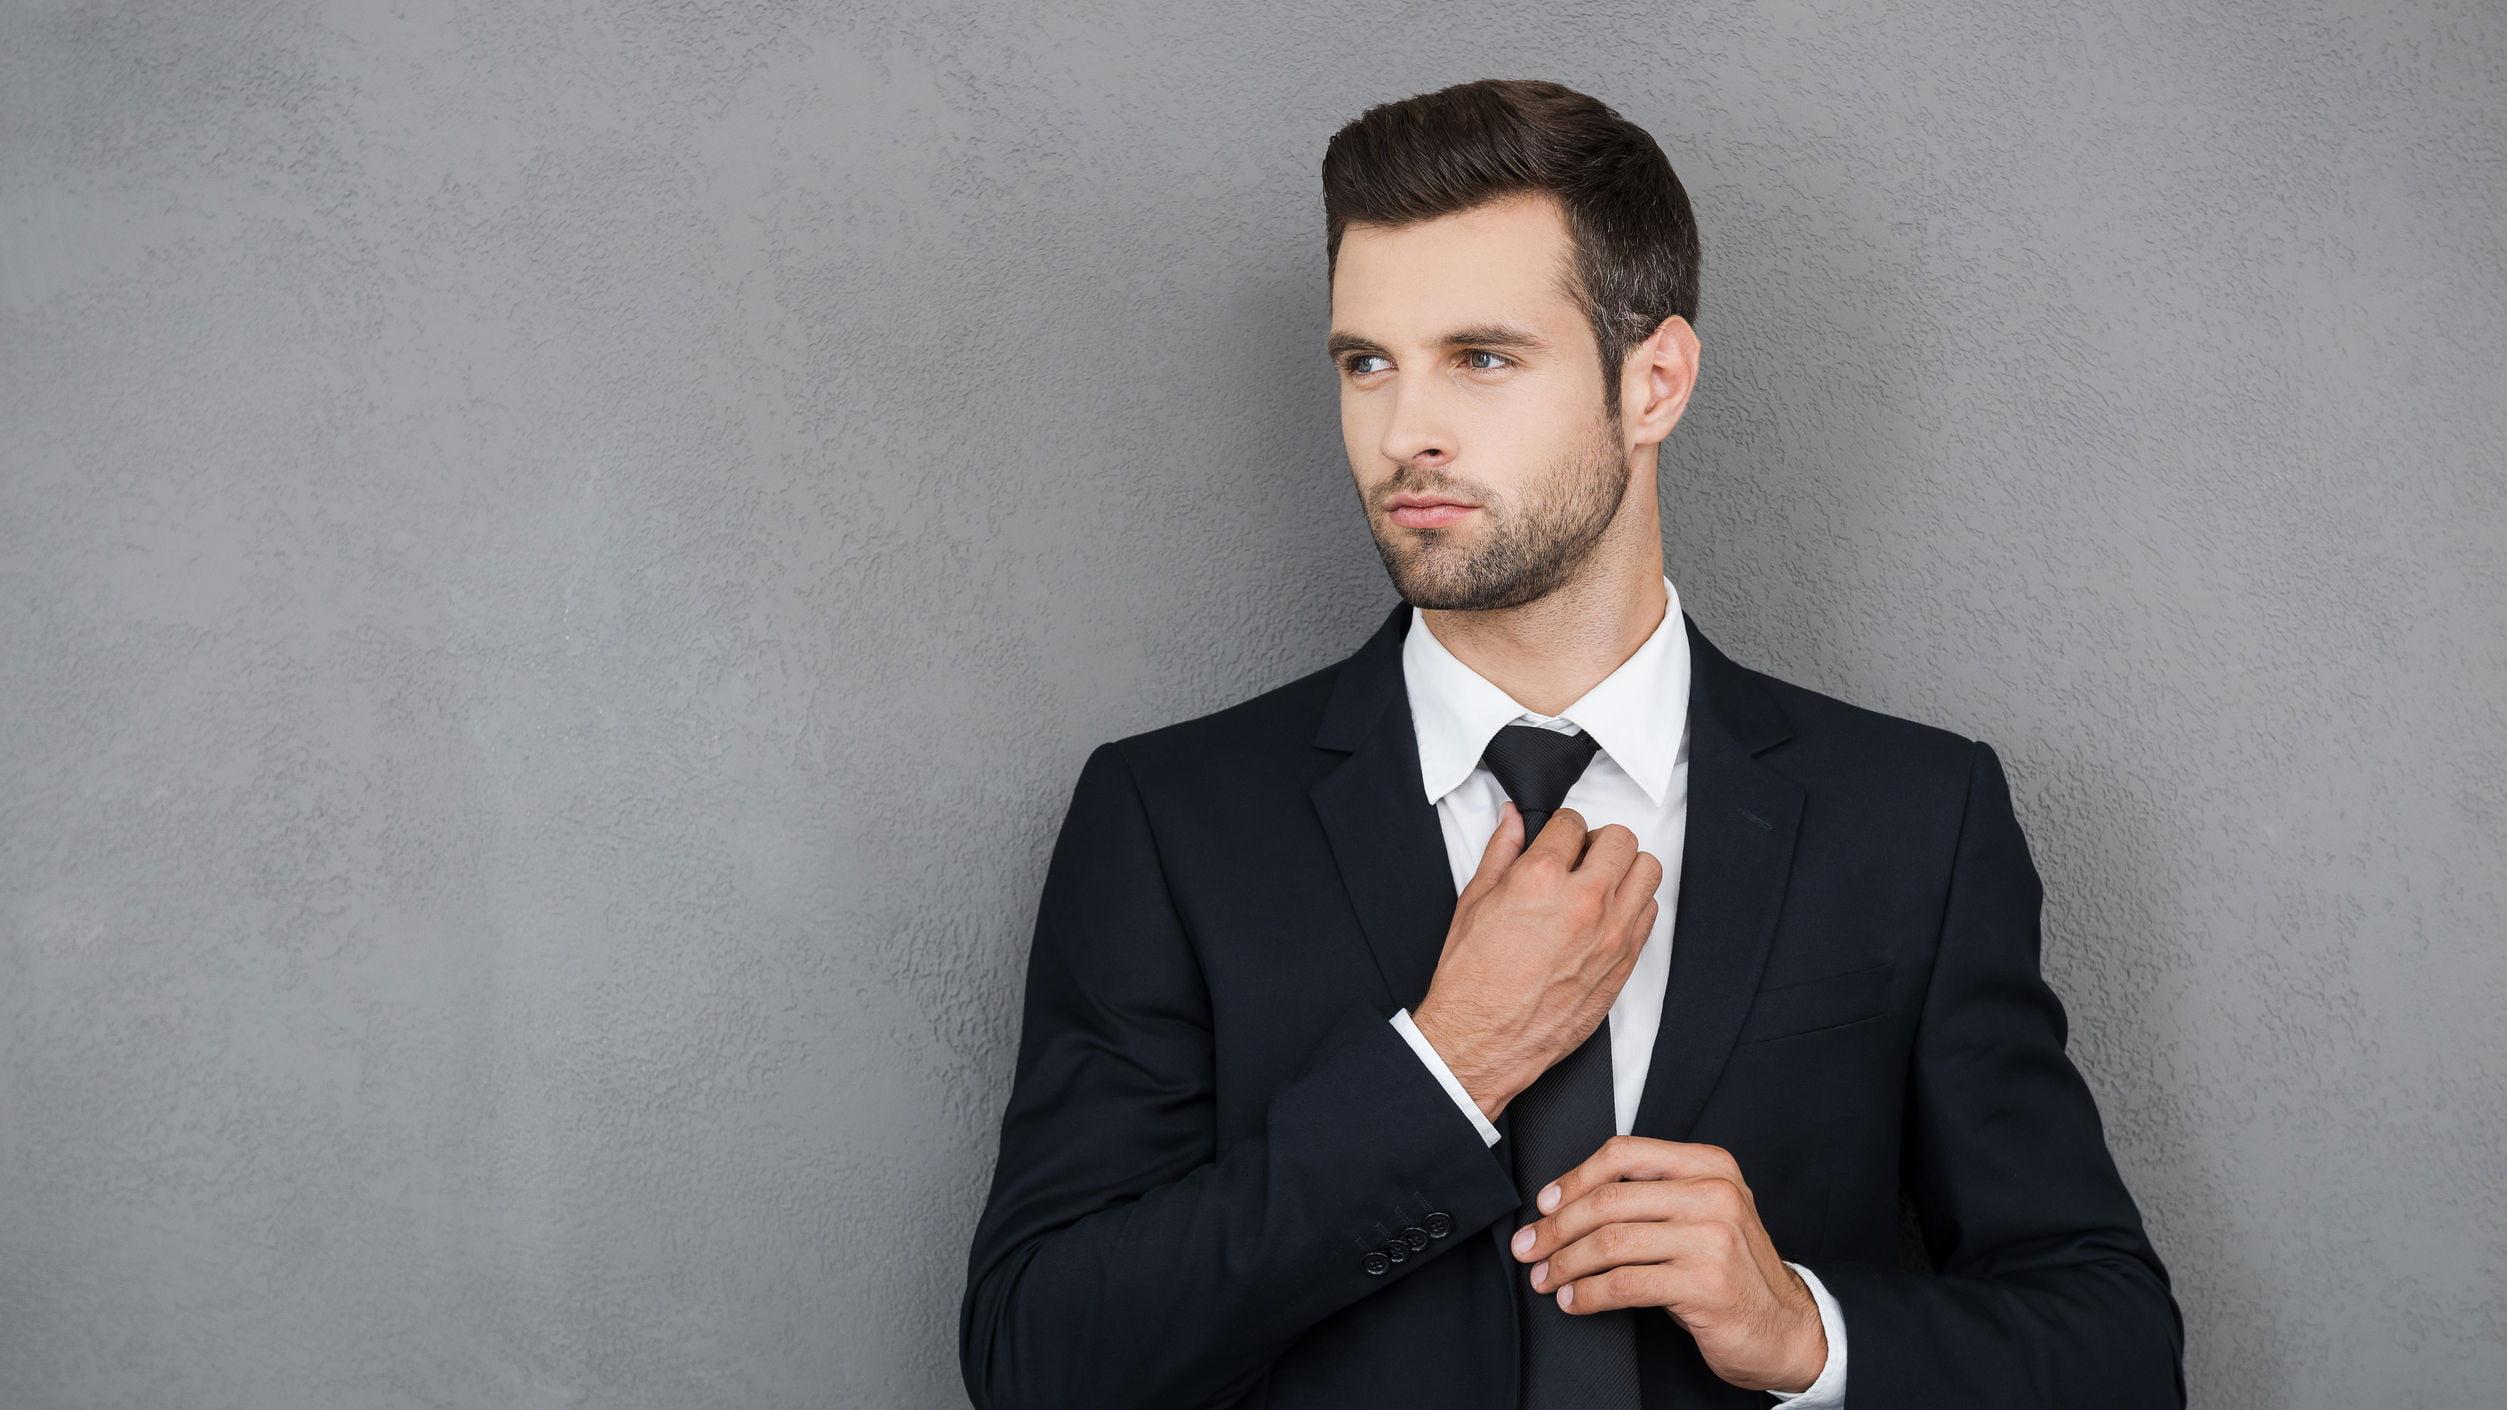 Как понравиться симпатичному мужчине